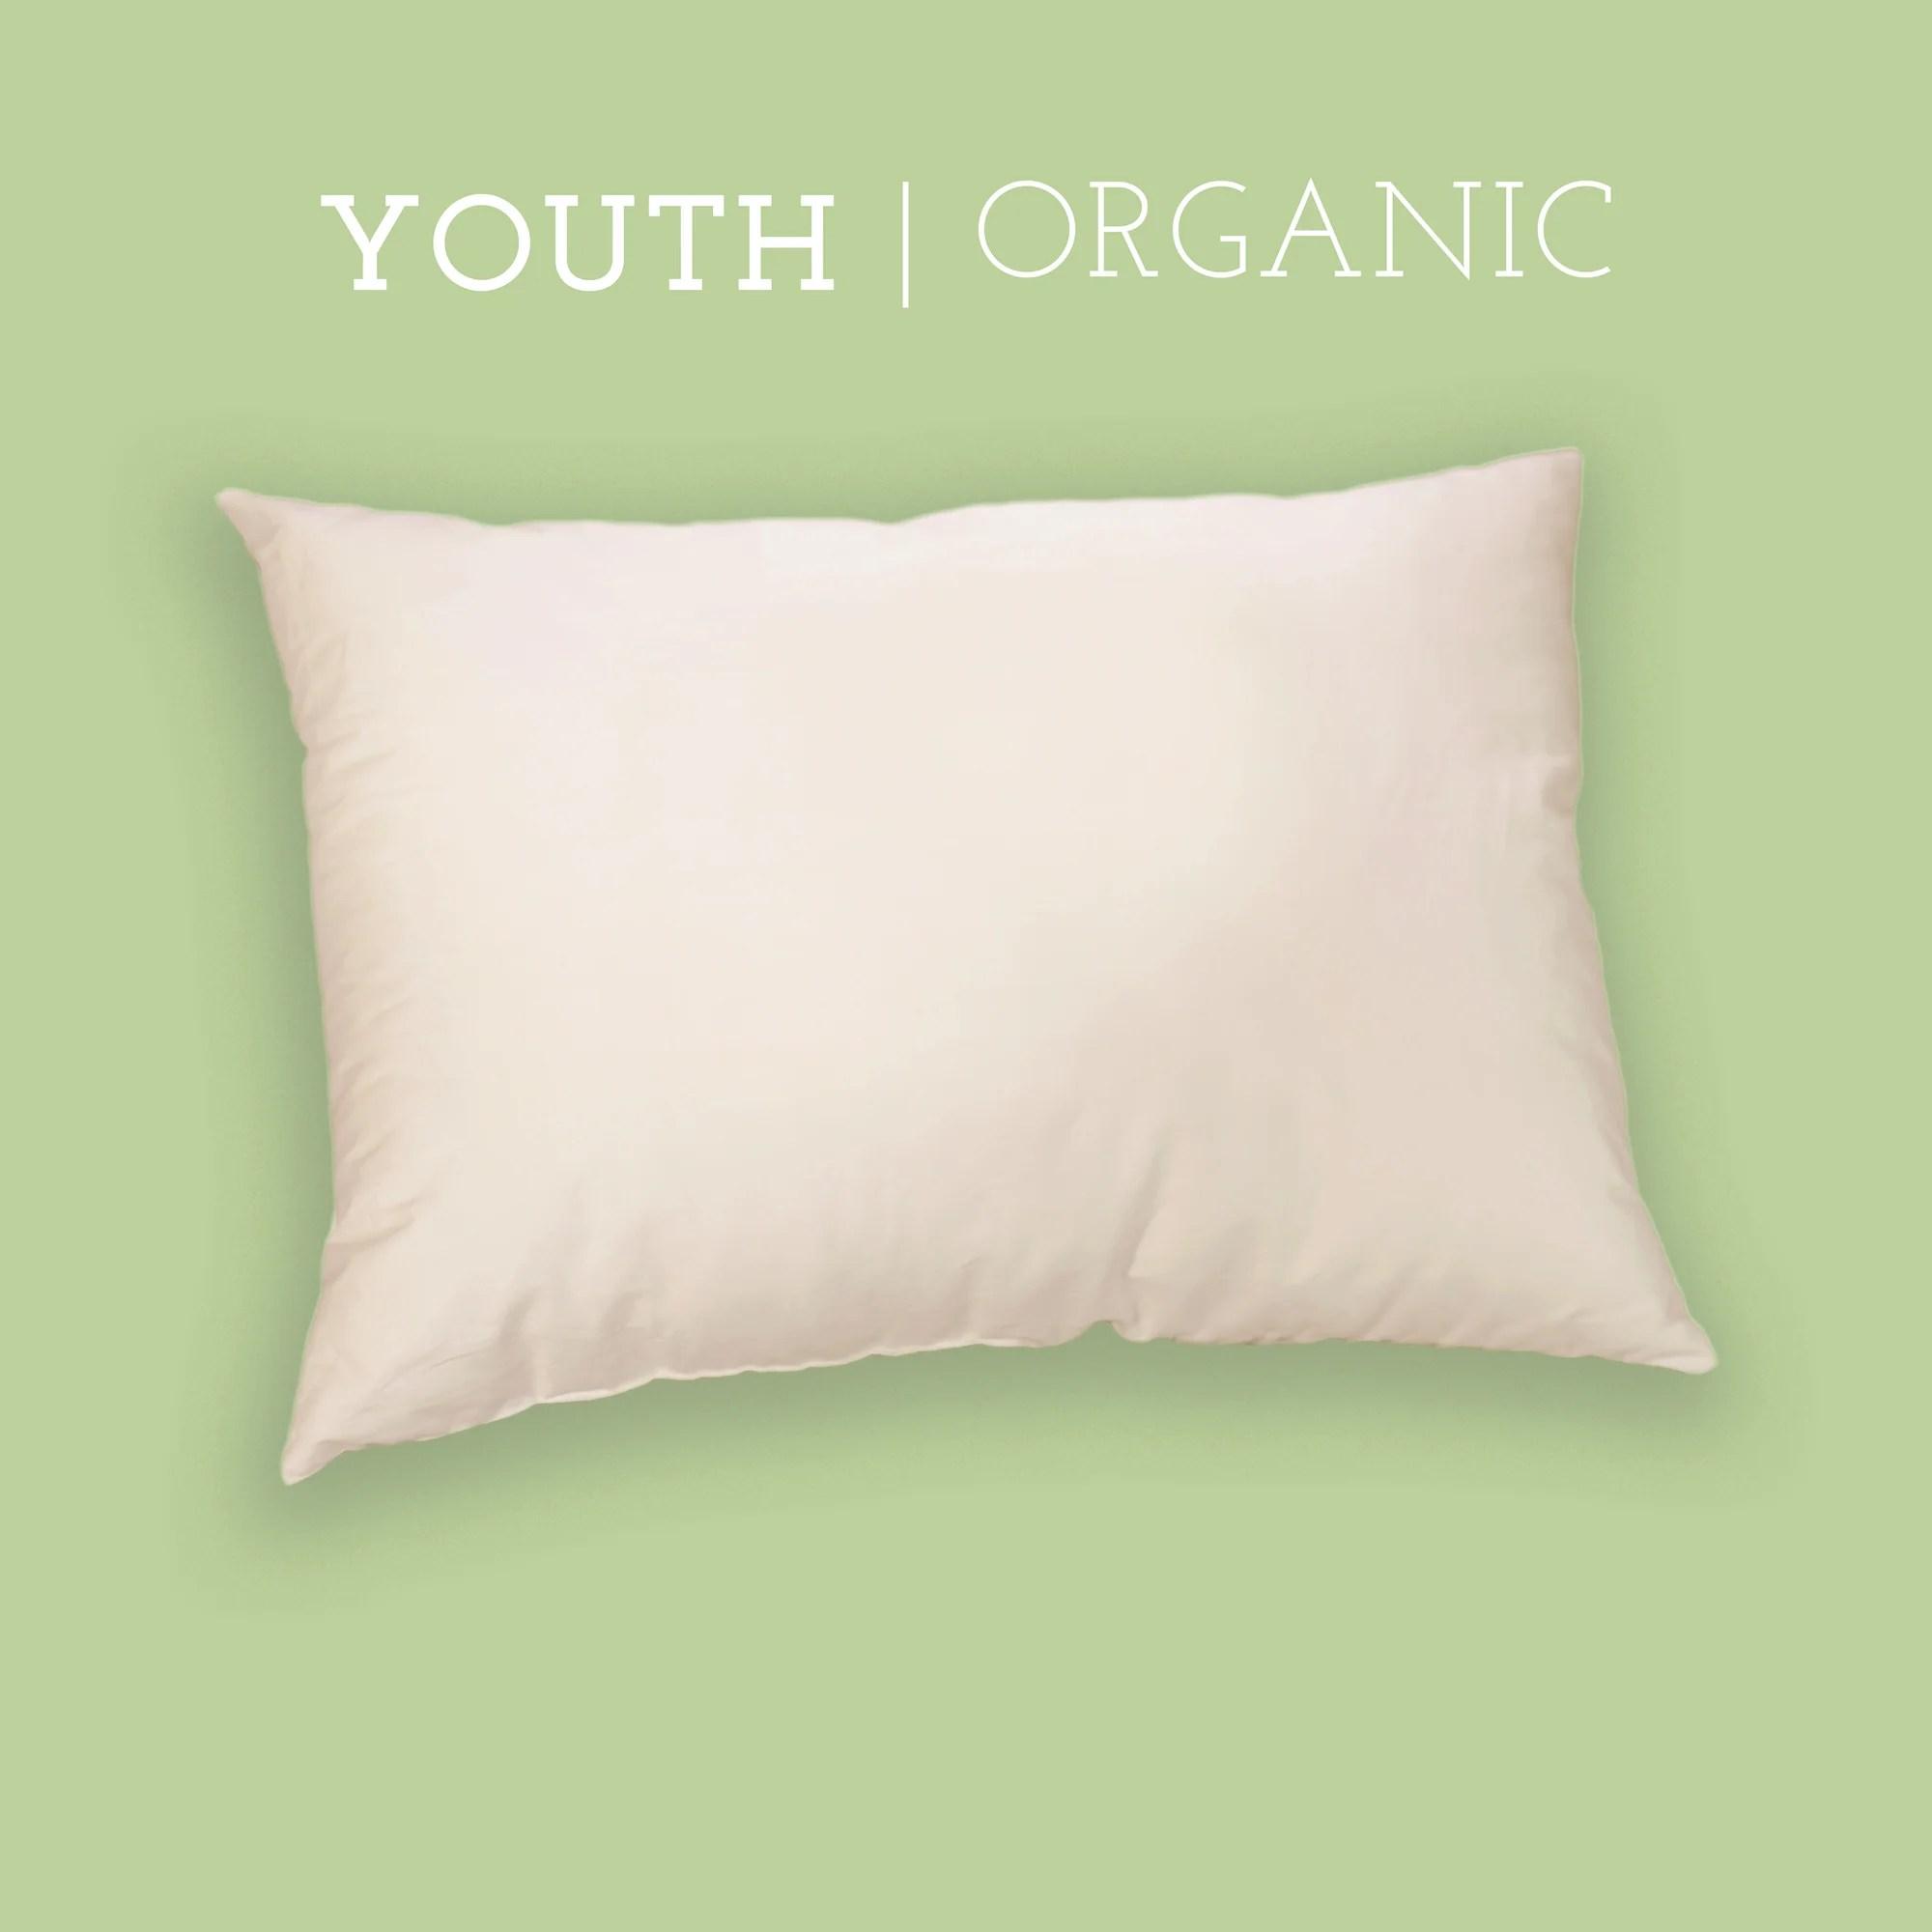 organic youth pillow 16 x 22